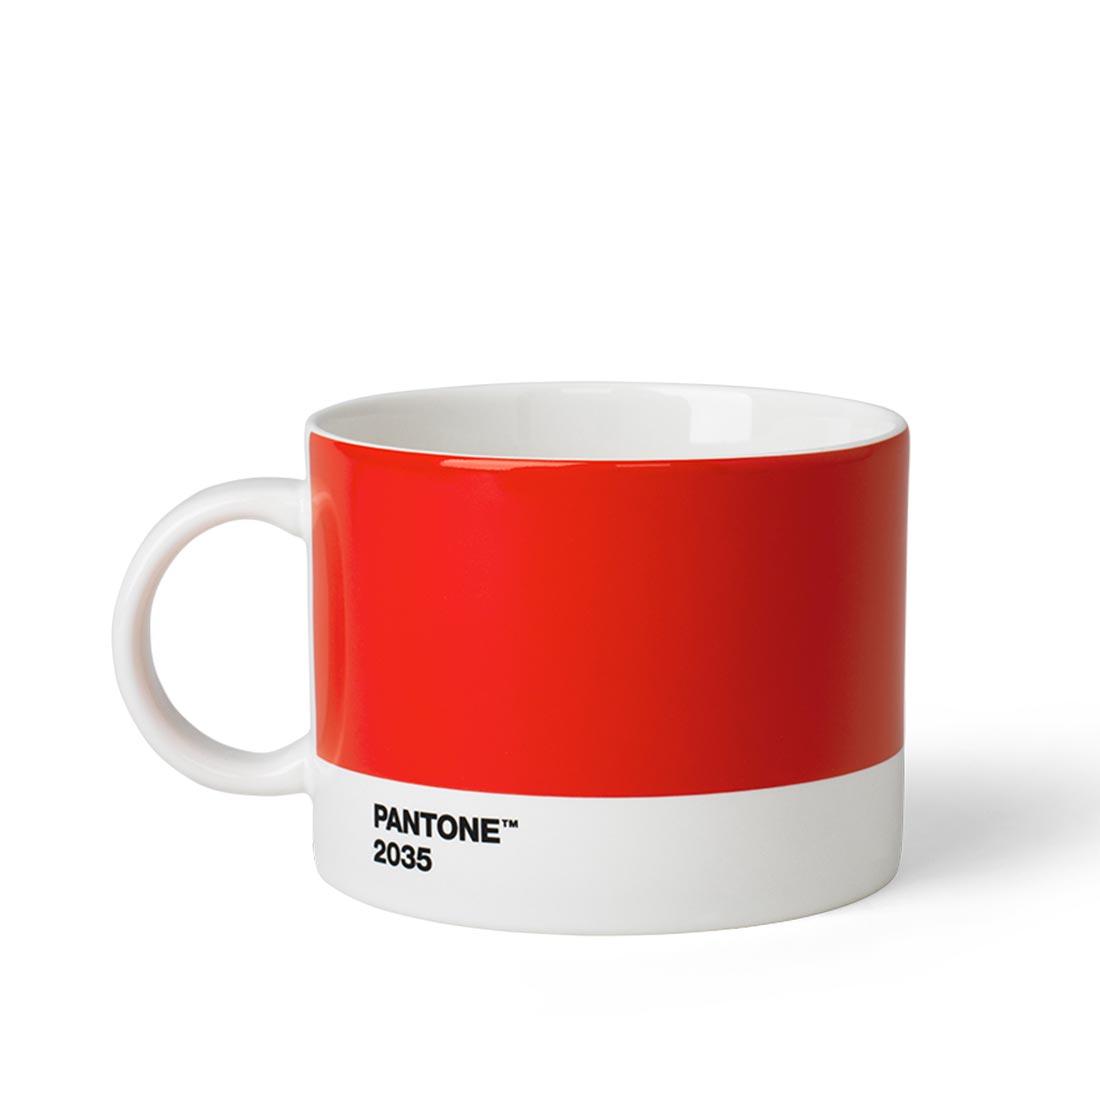 pantone-teetasse-milchkaffeetasse-2035-04-lichtraum24